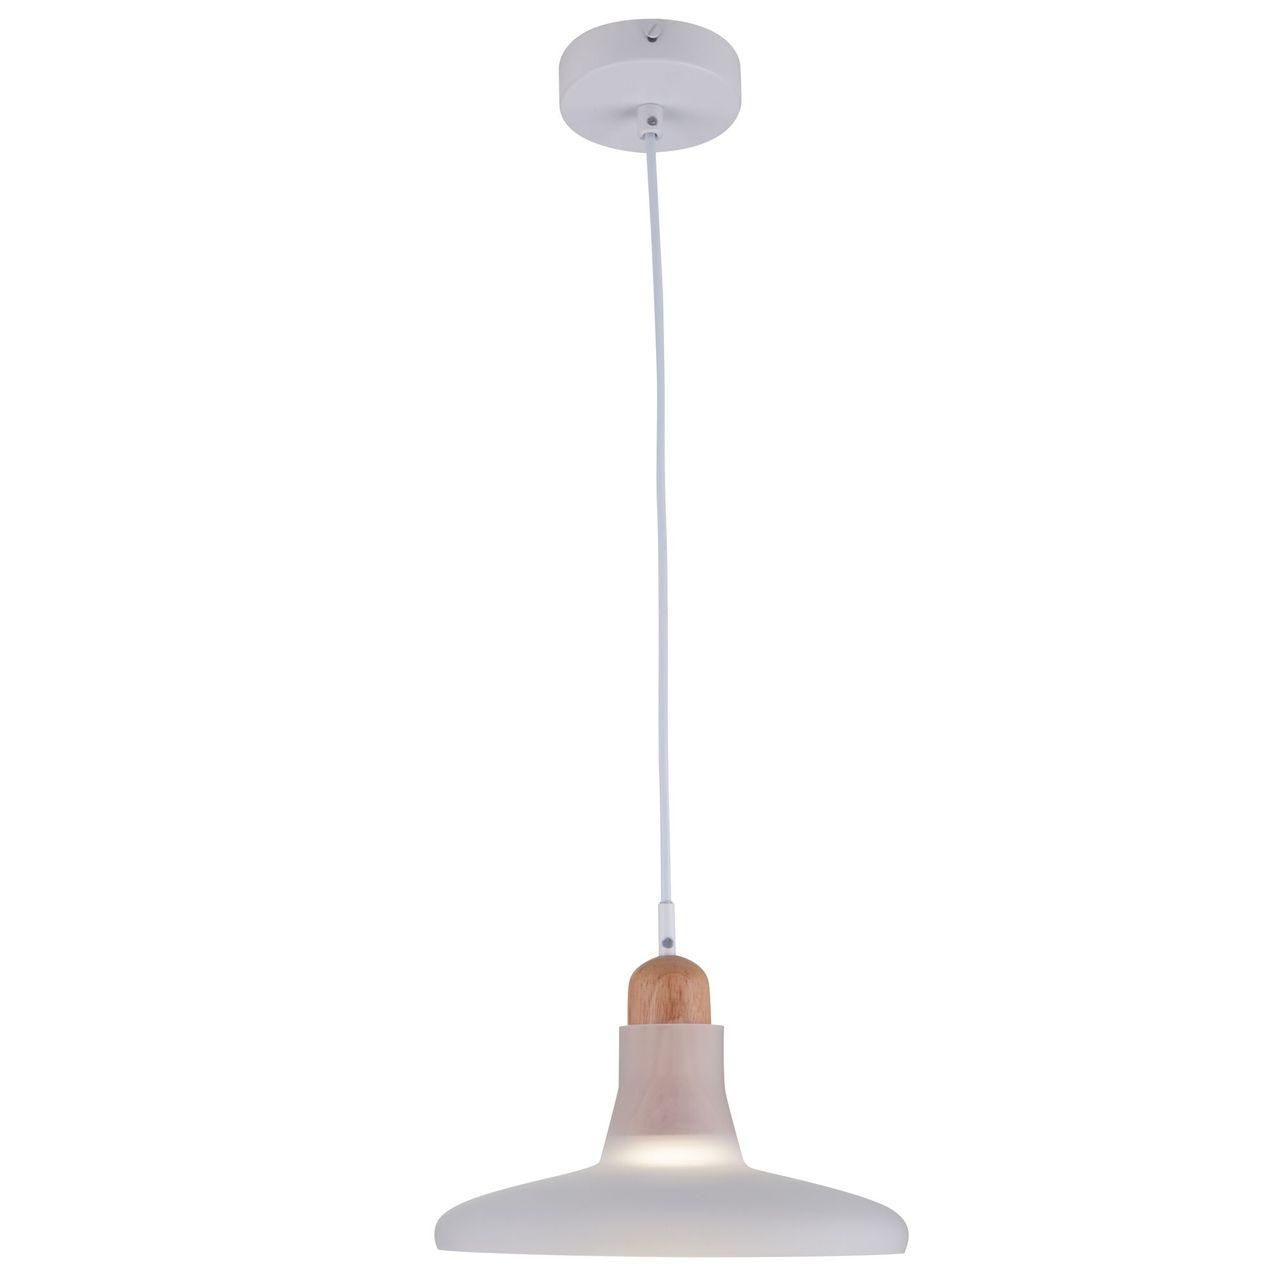 Подвесной светильник Maytoni Ola P017PL-01W фото